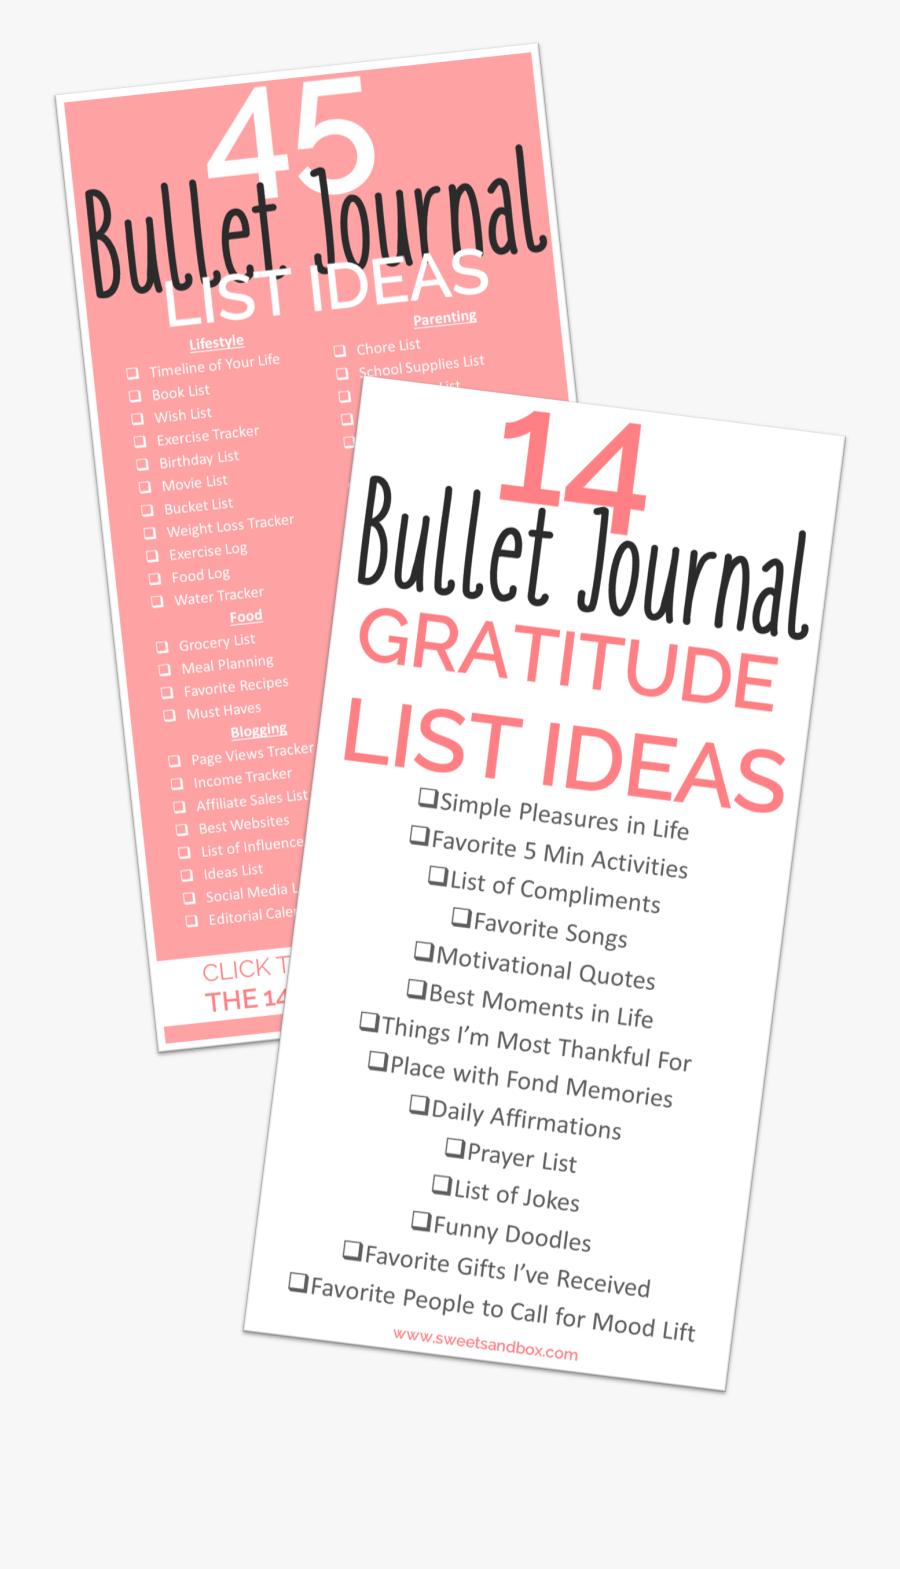 Transparent Bullet Bill Png - Bullet Journal, Transparent Clipart